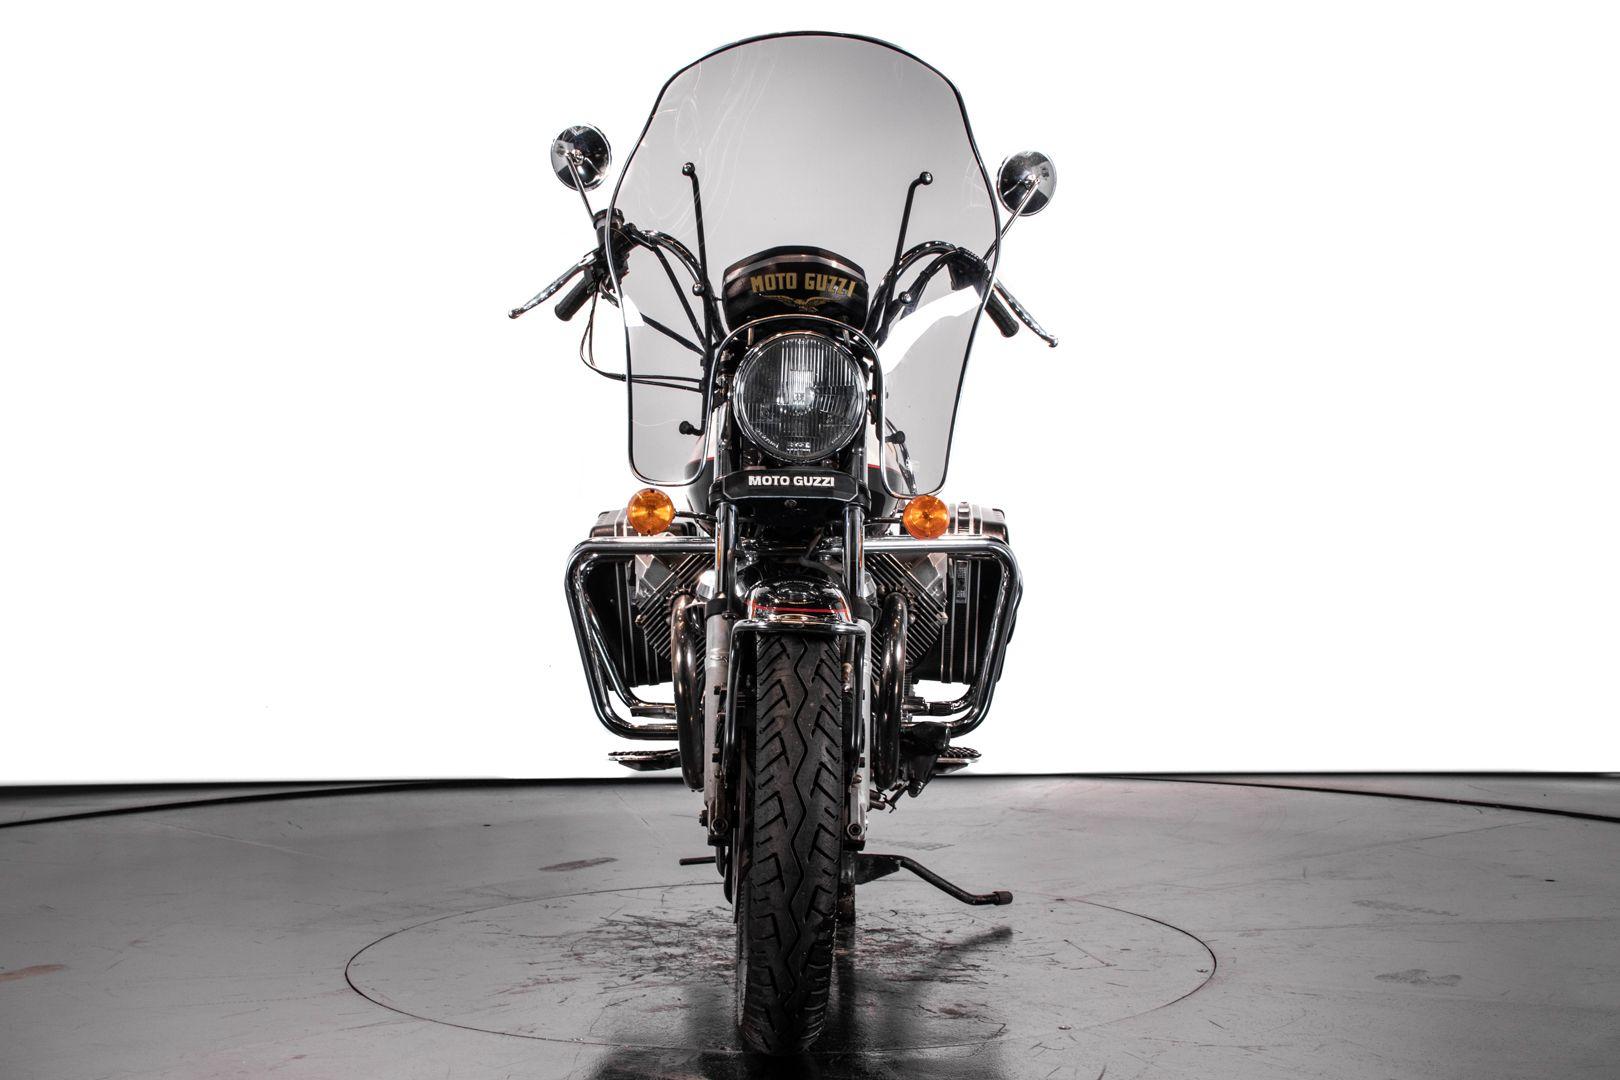 1983 Moto Guzzi California 2 84763